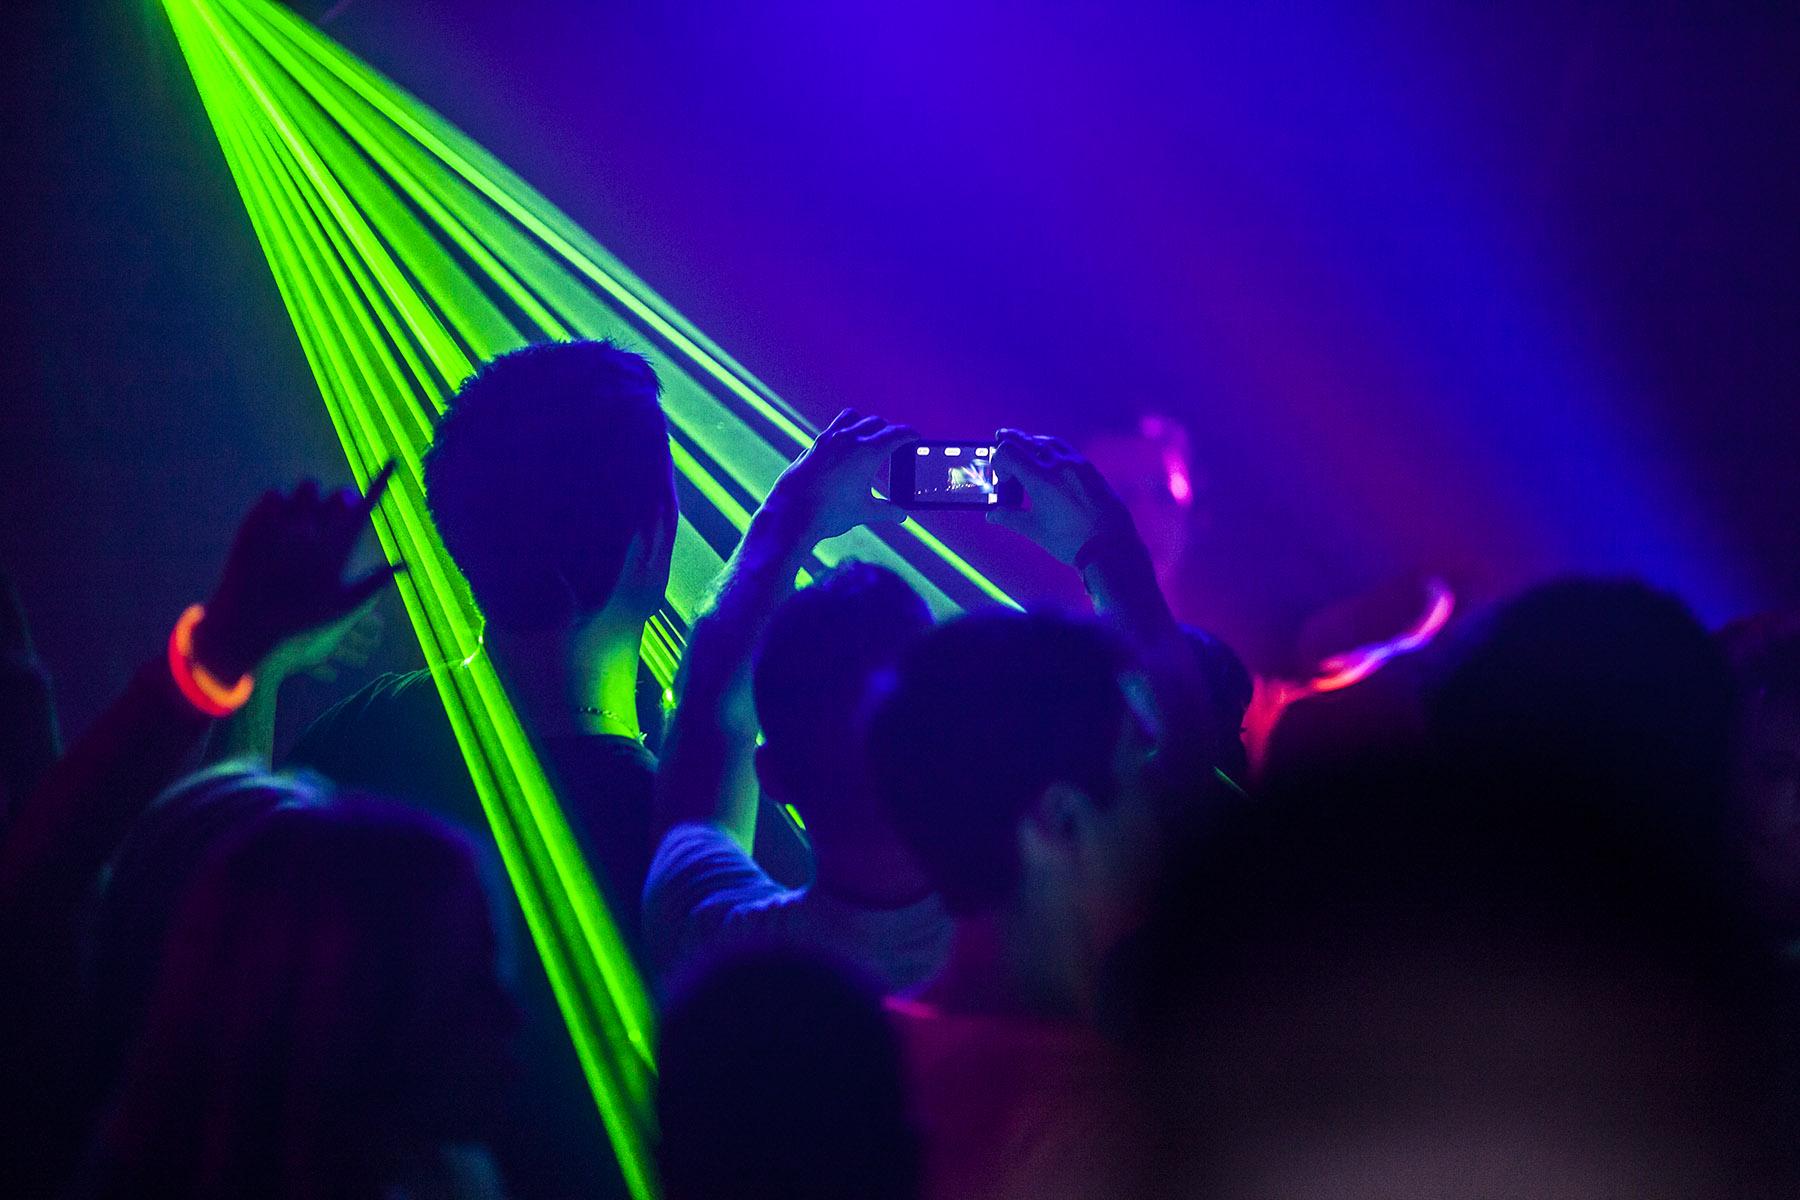 Rave Concert Laser Crowd concerts people music wallpaper background 1800x1200